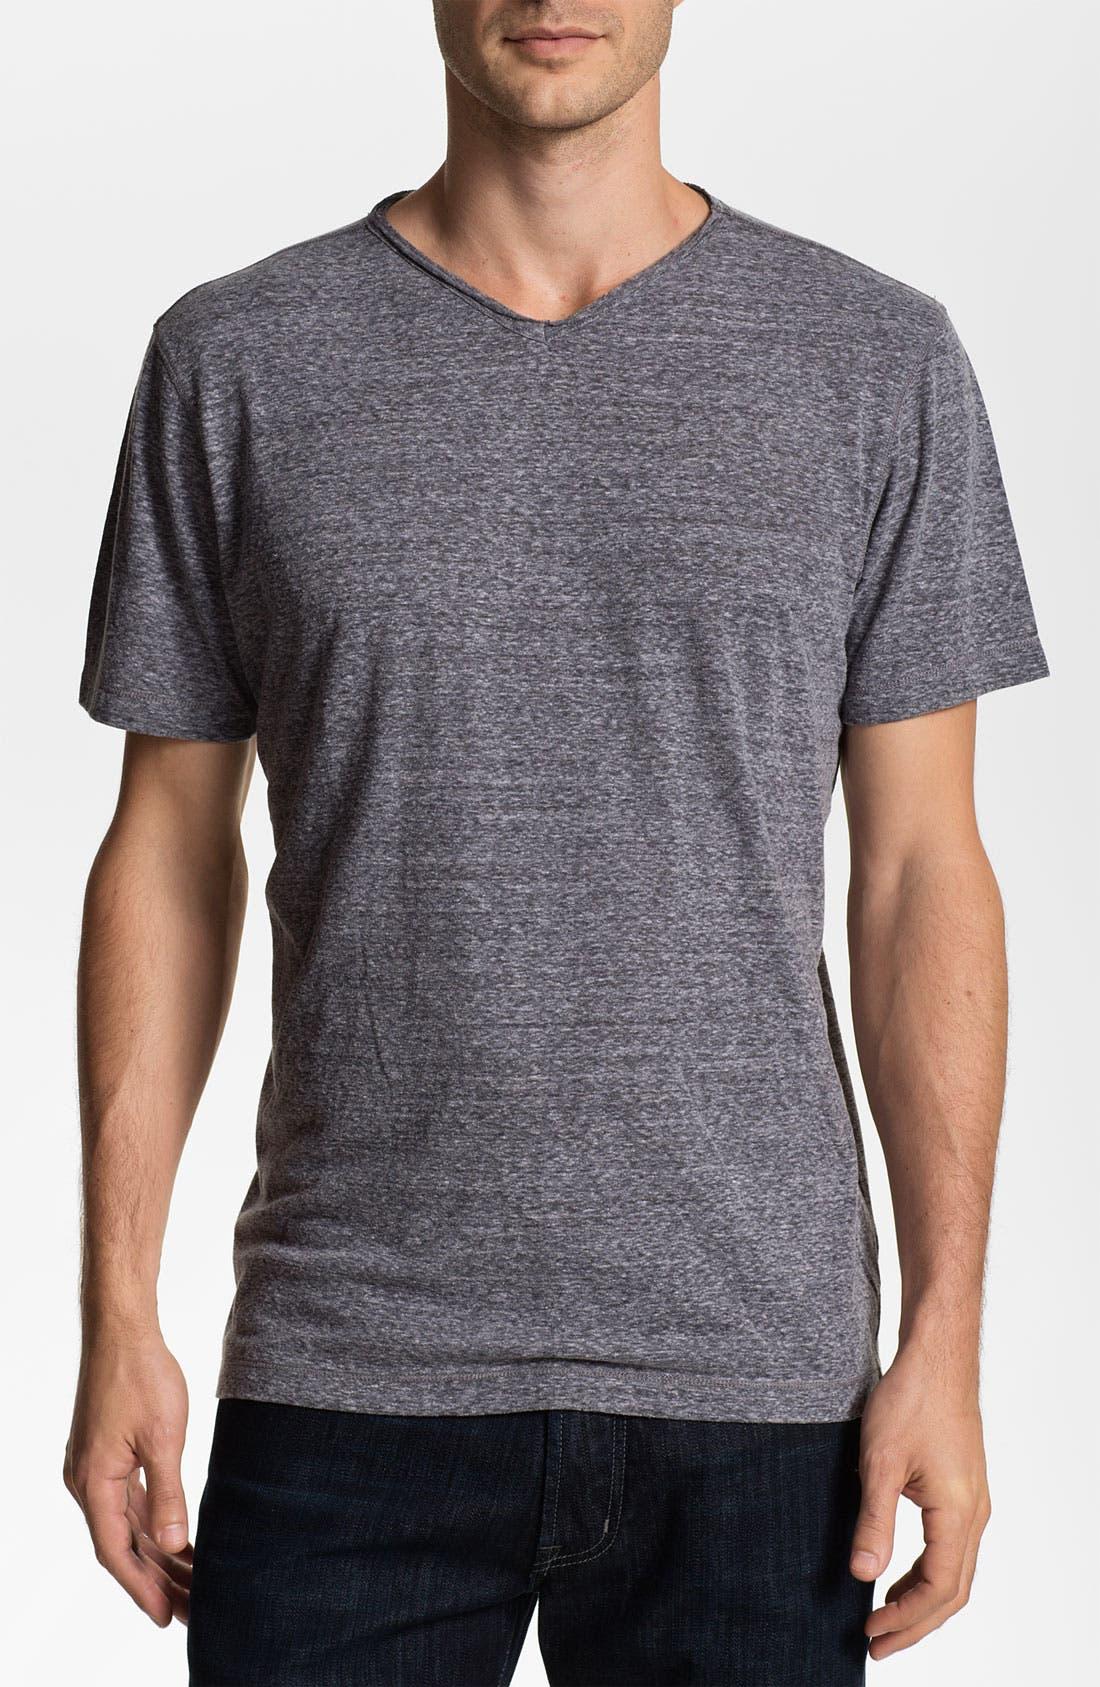 Main Image - Daniel Buchler Heathered Cotton Blend V-Neck T-Shirt